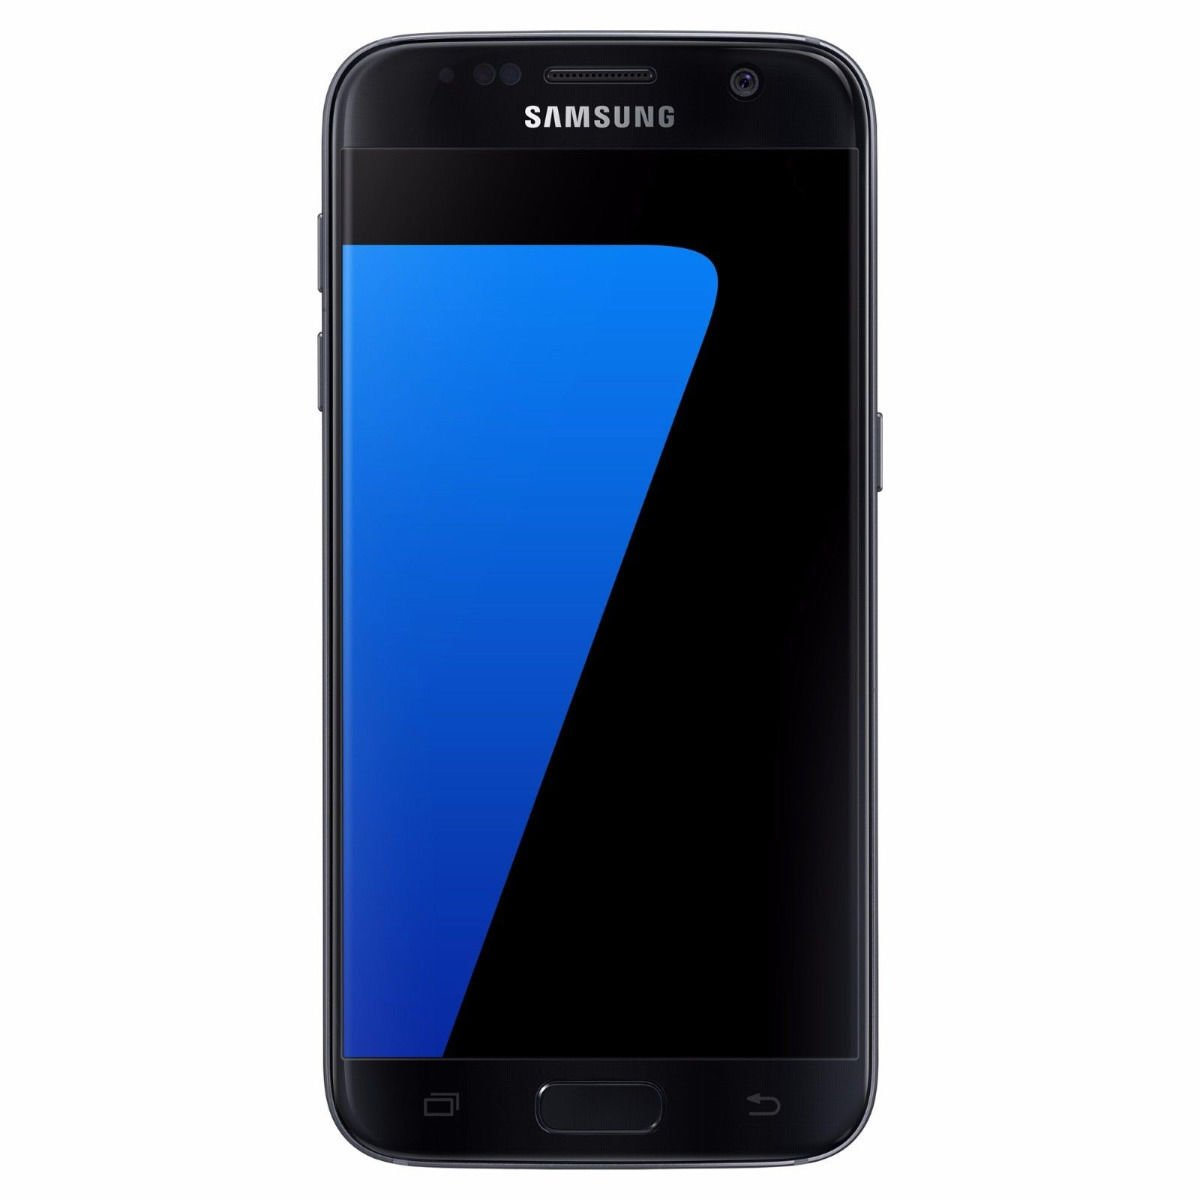 Samsung Galaxy S7 SM-G930T - 32GB - GSM Unlocked - Black Onyx (Renewed)